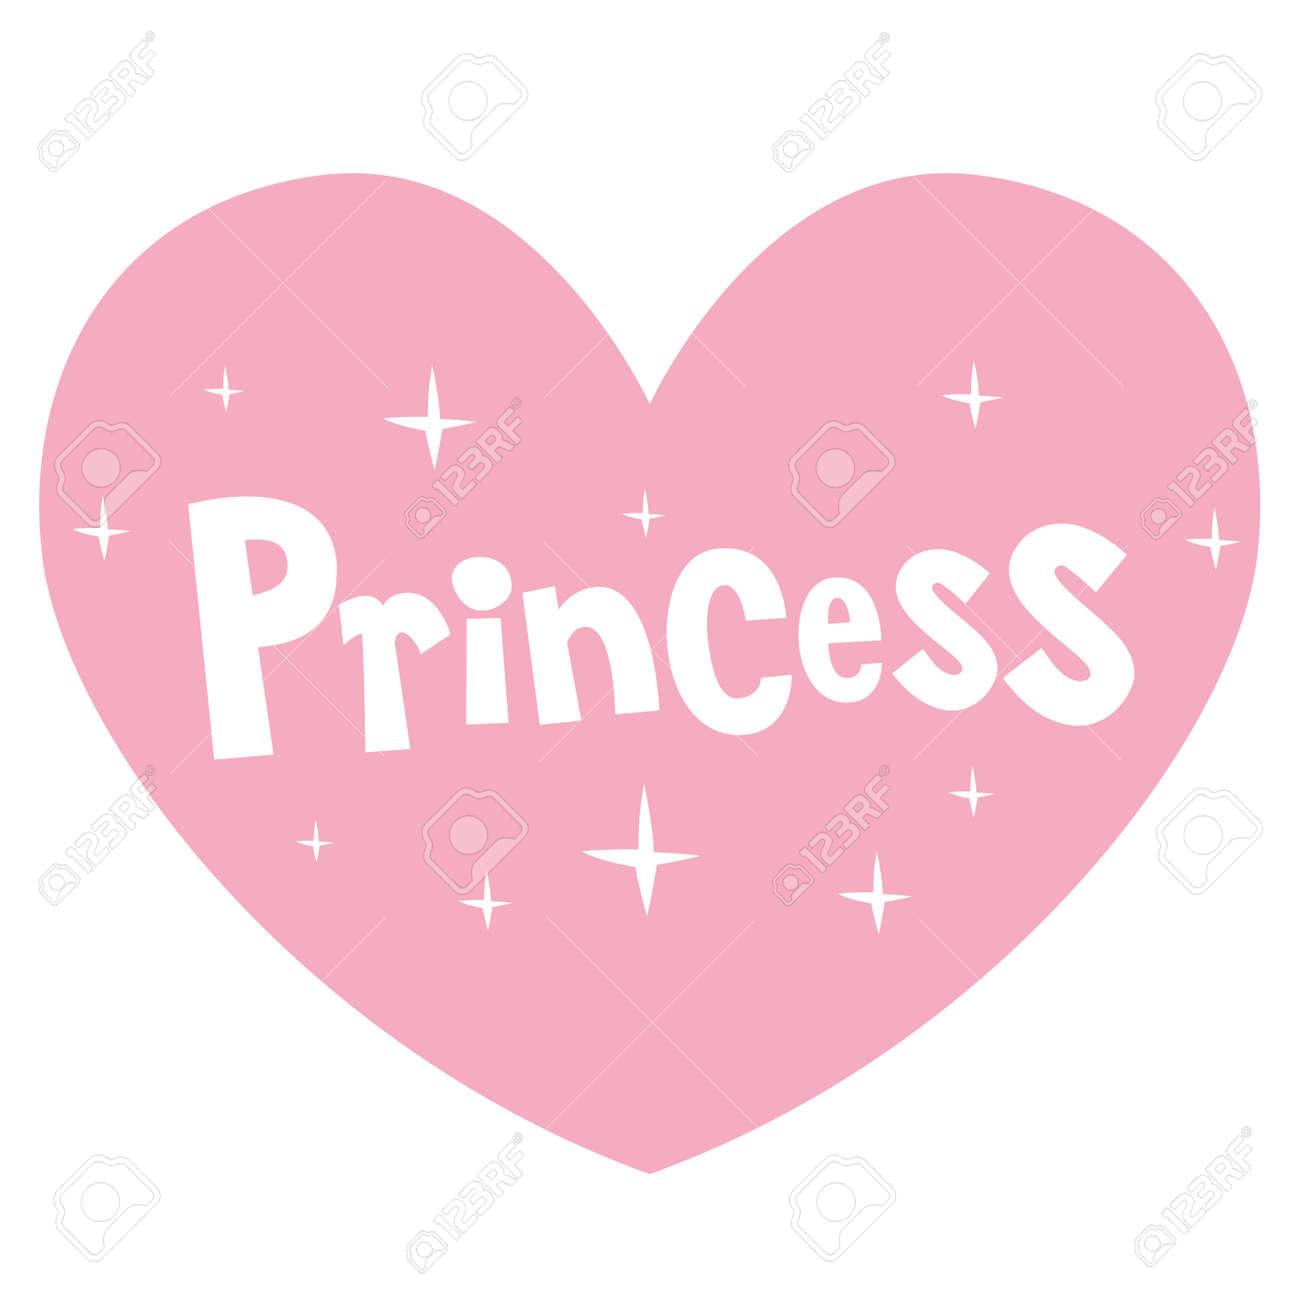 princess pink heart shaped lettering design - 80121371